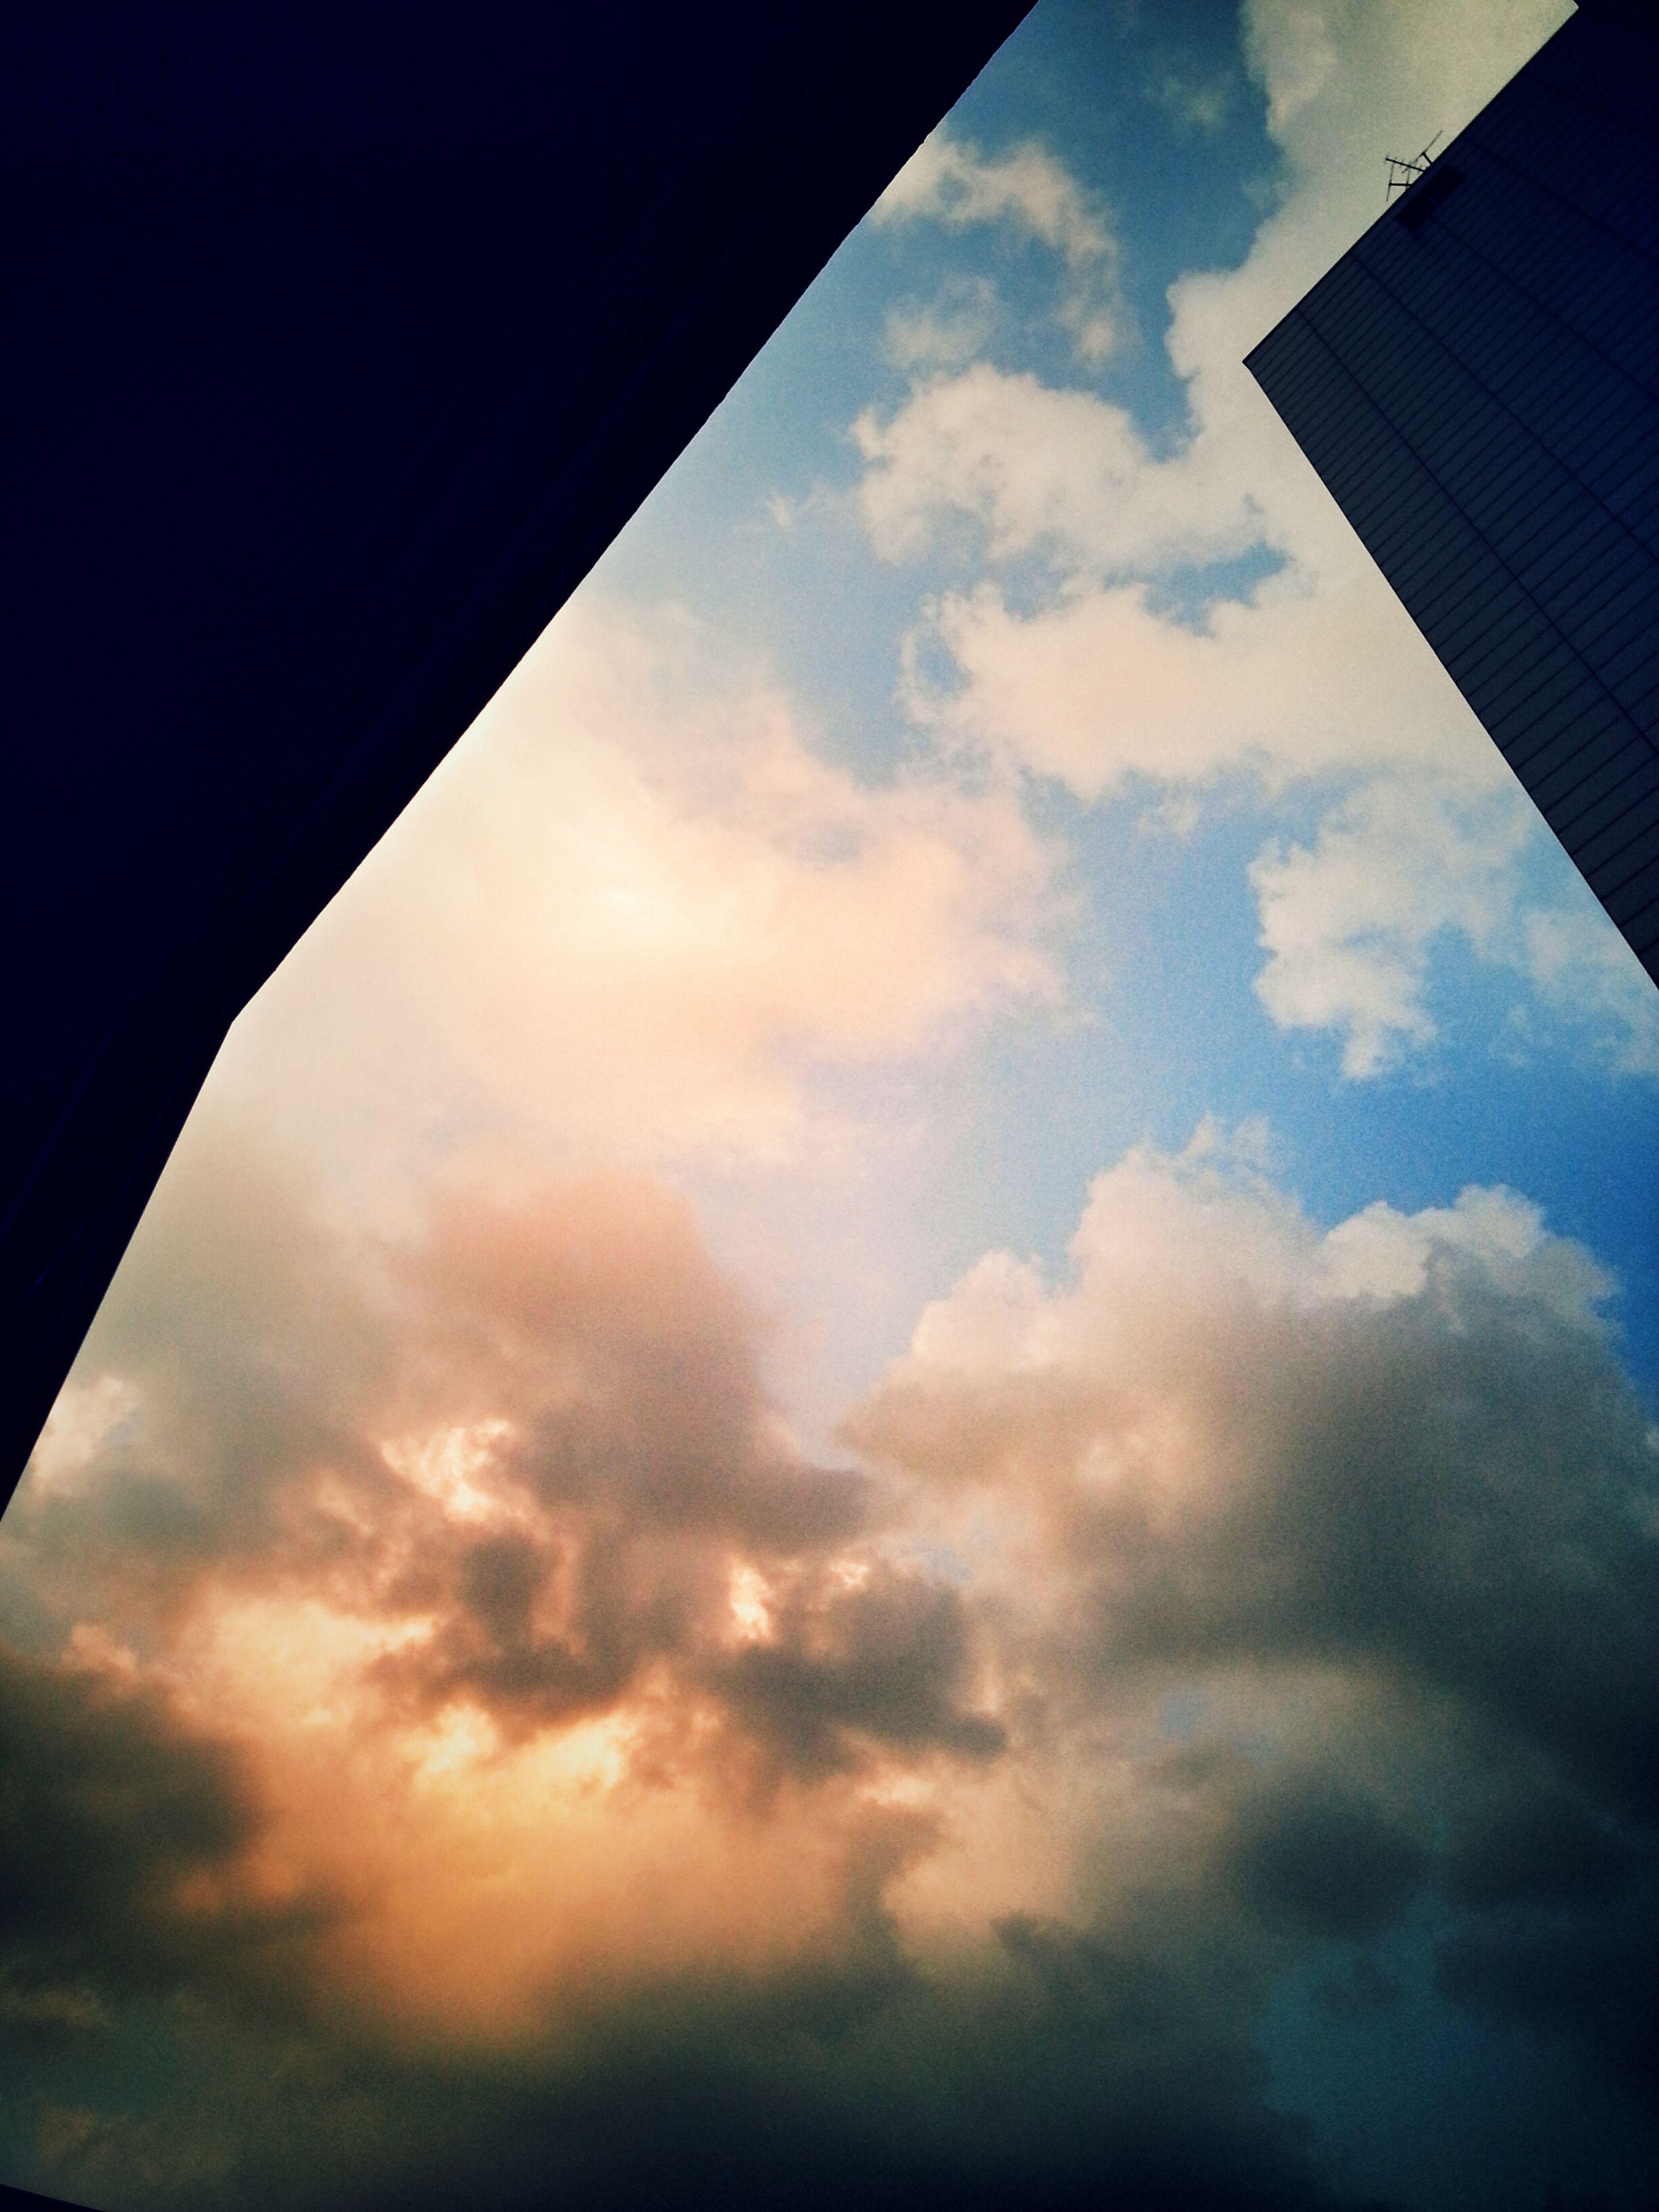 sky, low angle view, cloud - sky, architecture, built structure, cloud, building exterior, cloudy, sunset, silhouette, no people, cloudscape, outdoors, building, nature, city, dusk, directly below, sunlight, blue